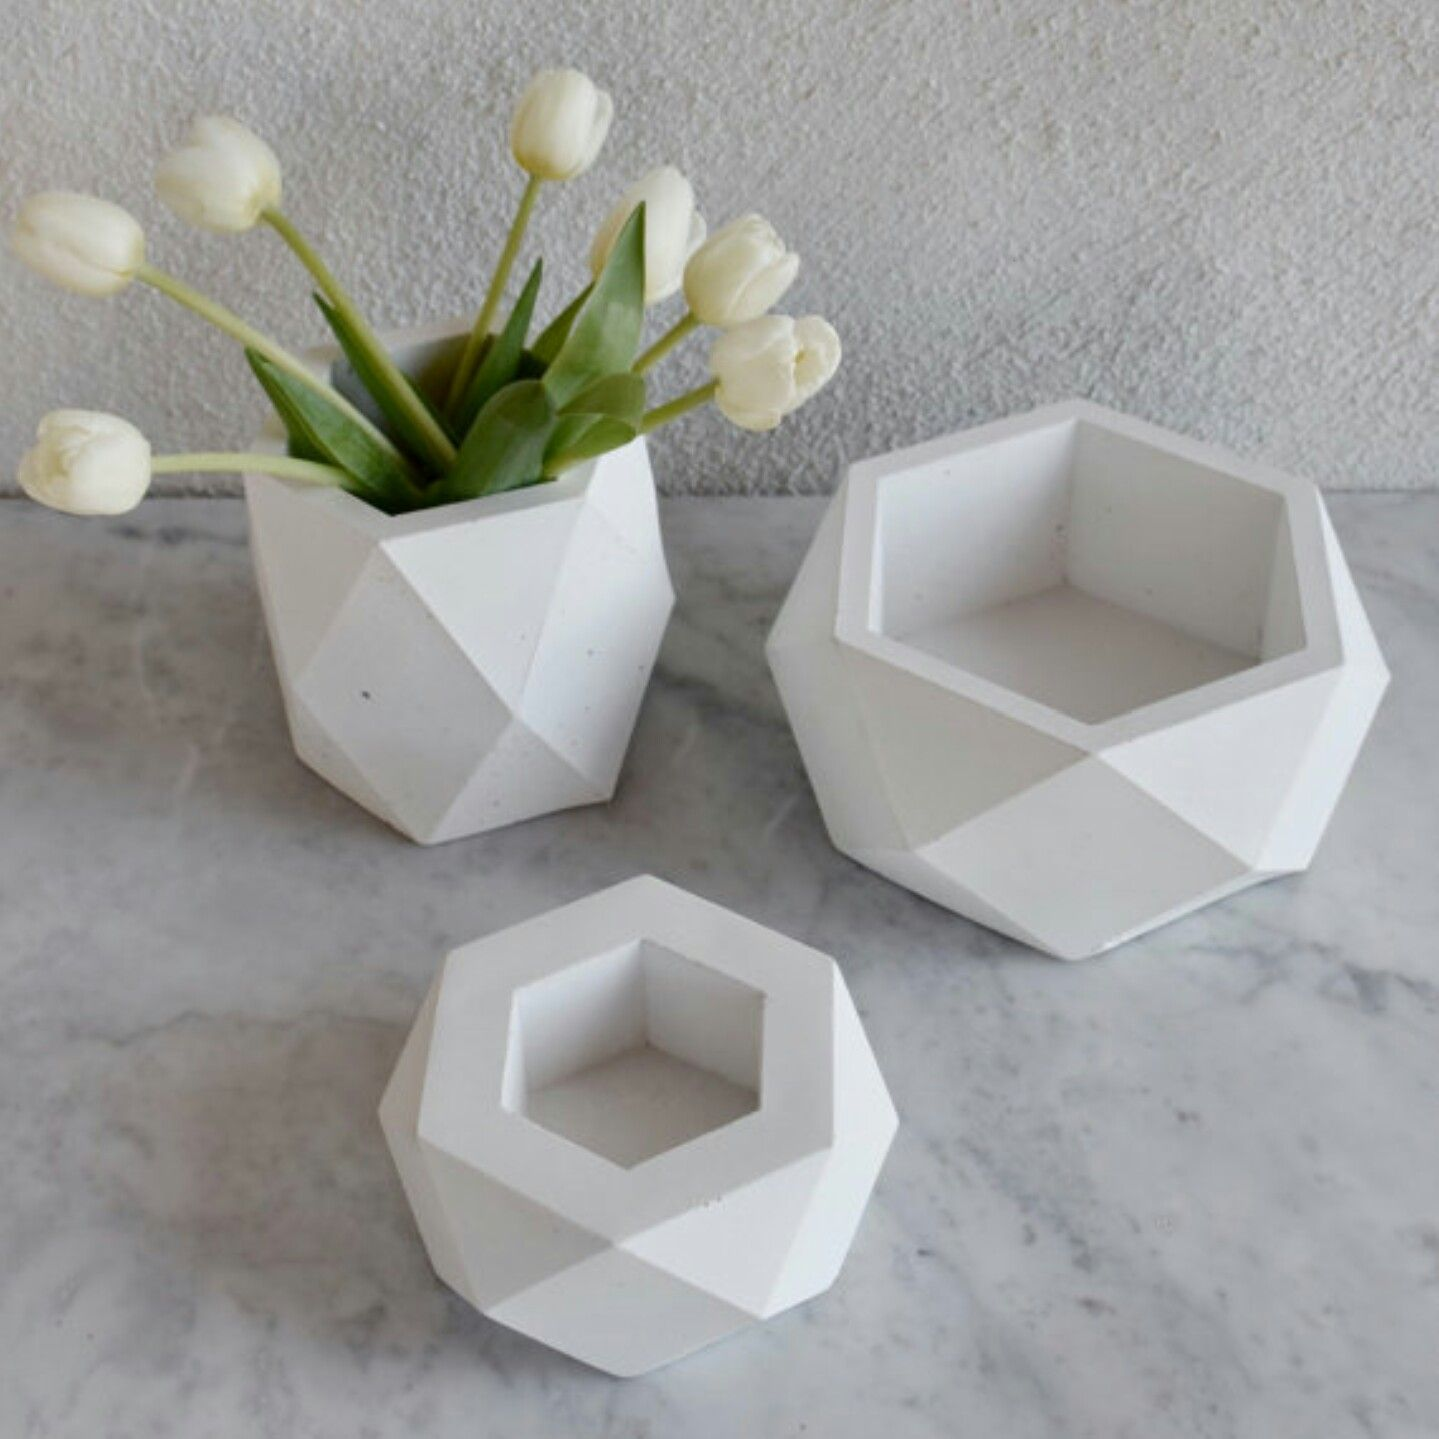 Geodesic Concrete Planter: Geometric Planters Via Etsy